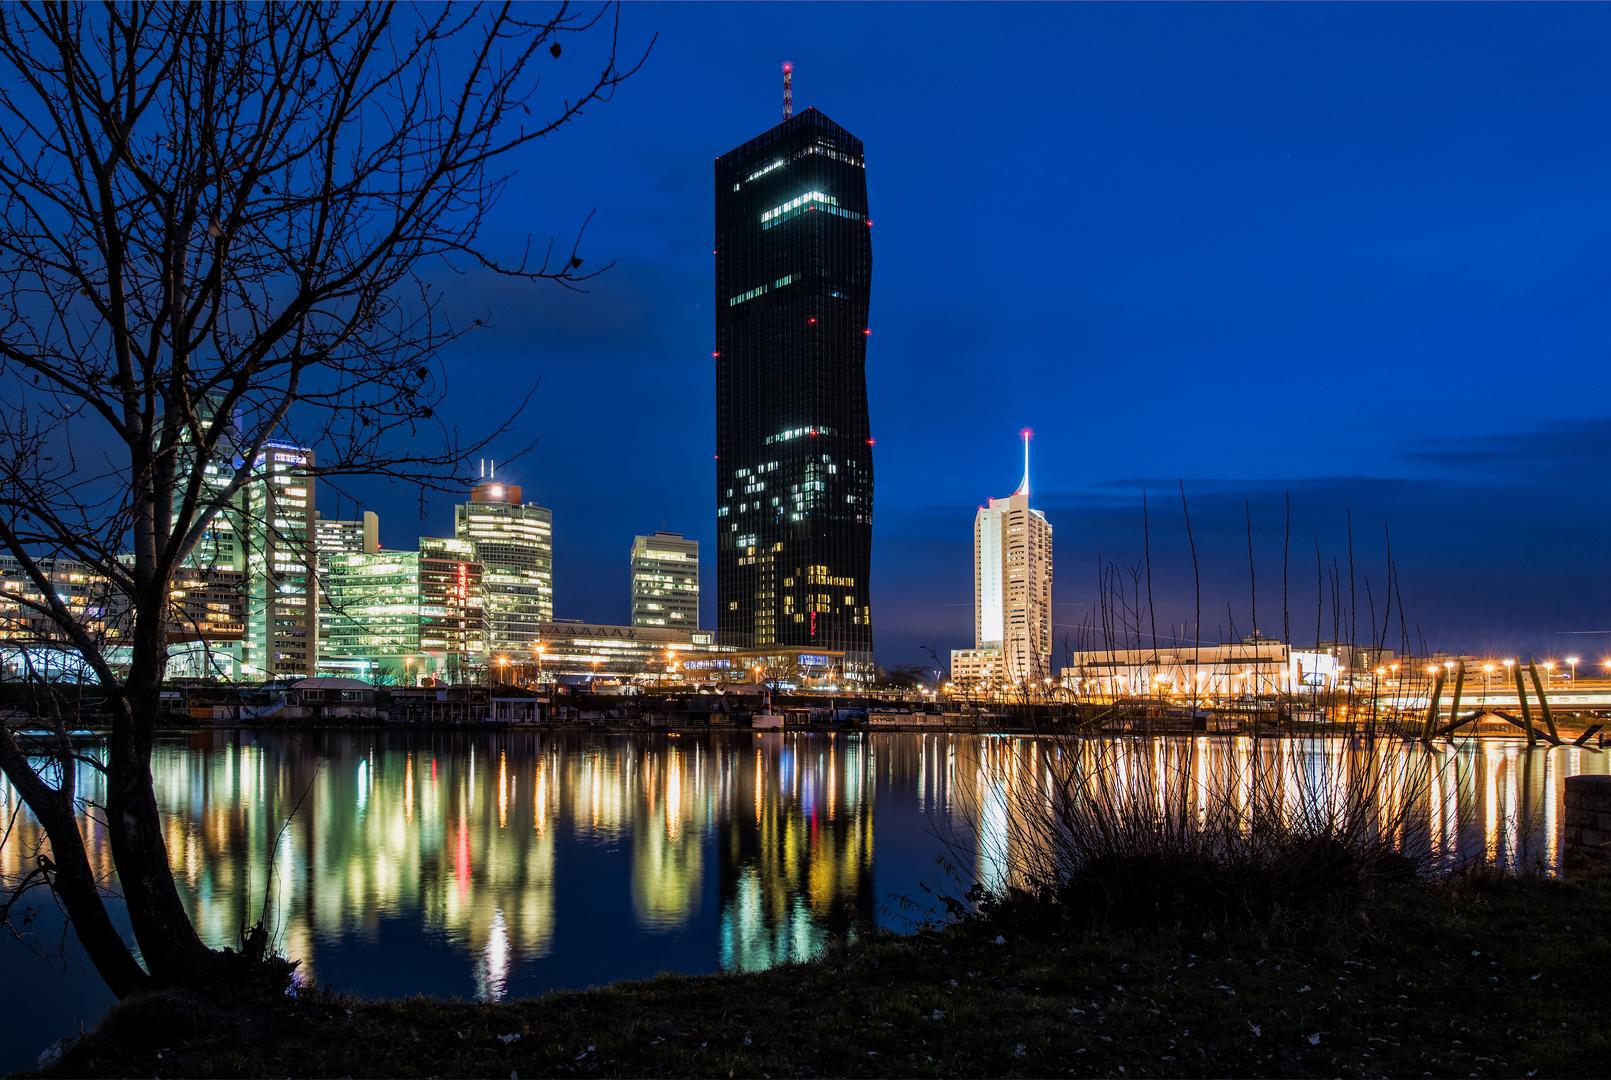 Vienna Donaucity mit DC-Tower